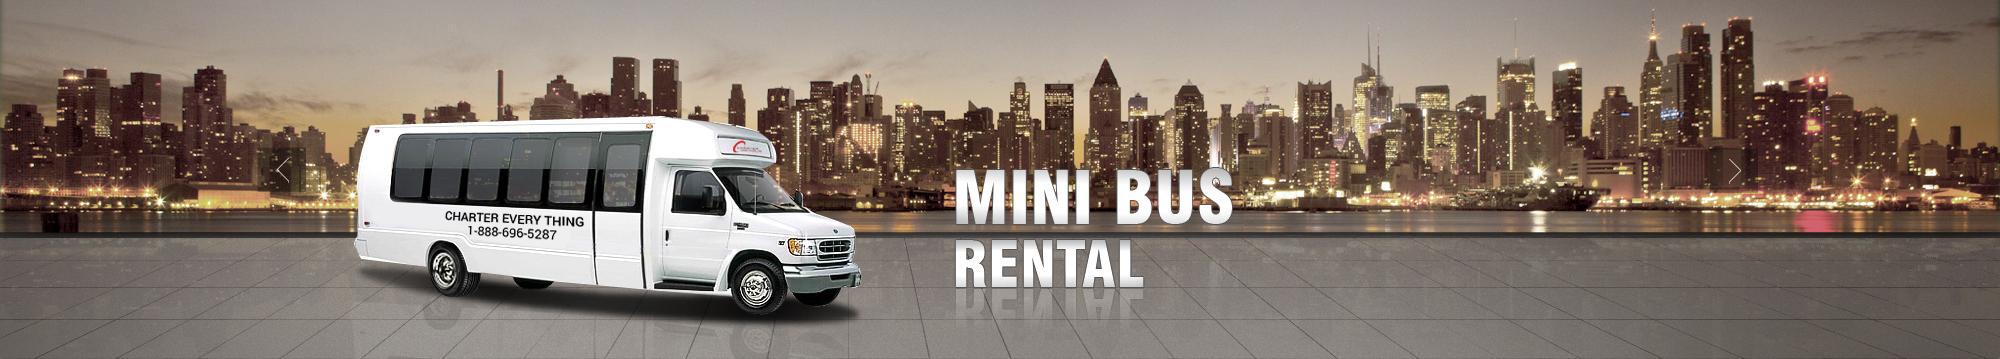 Mini Bus Rental